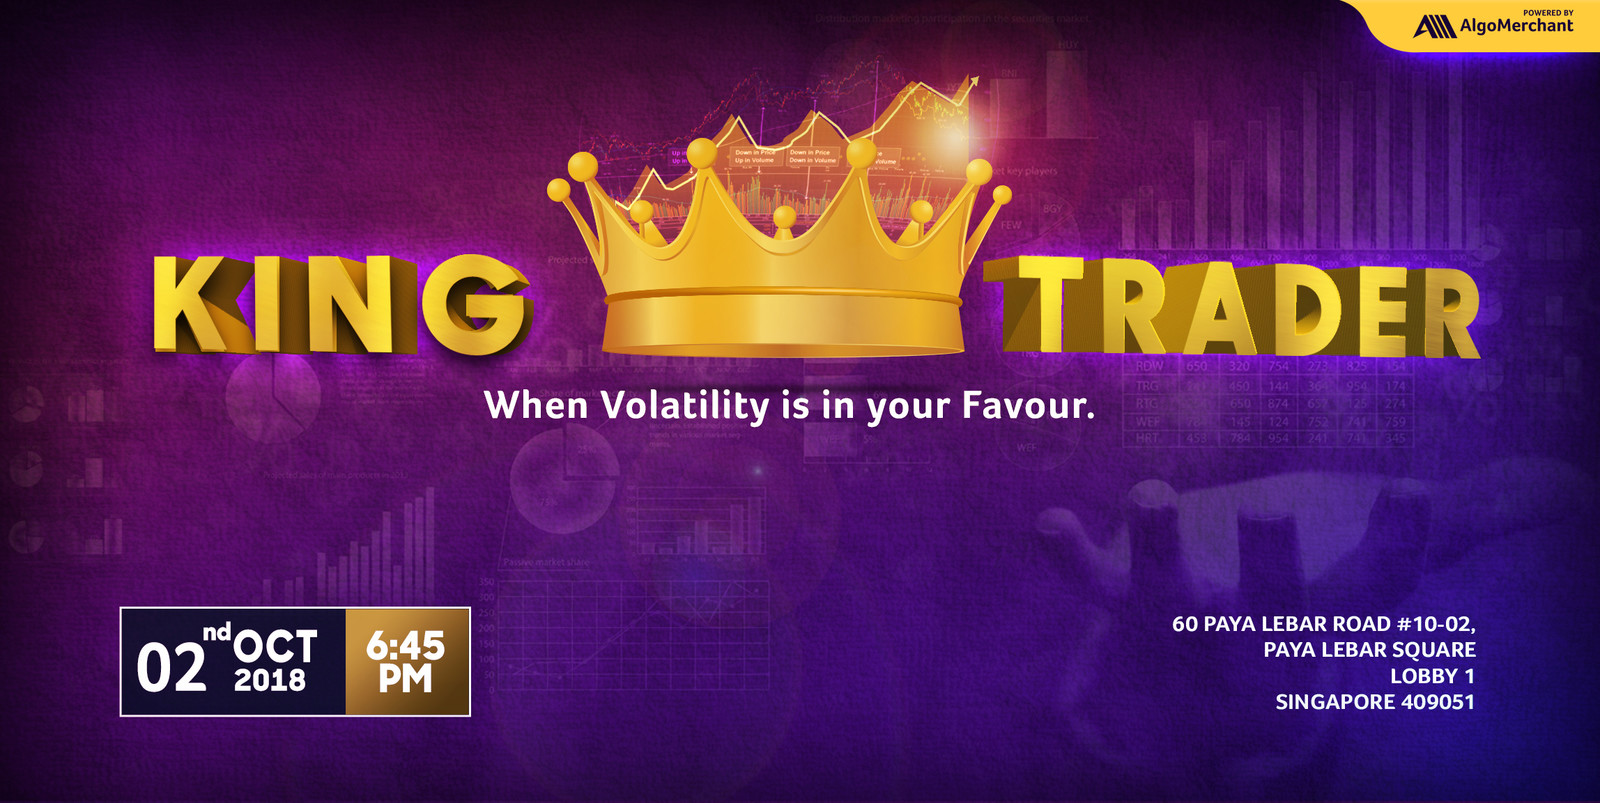 King Trader marketing campaign